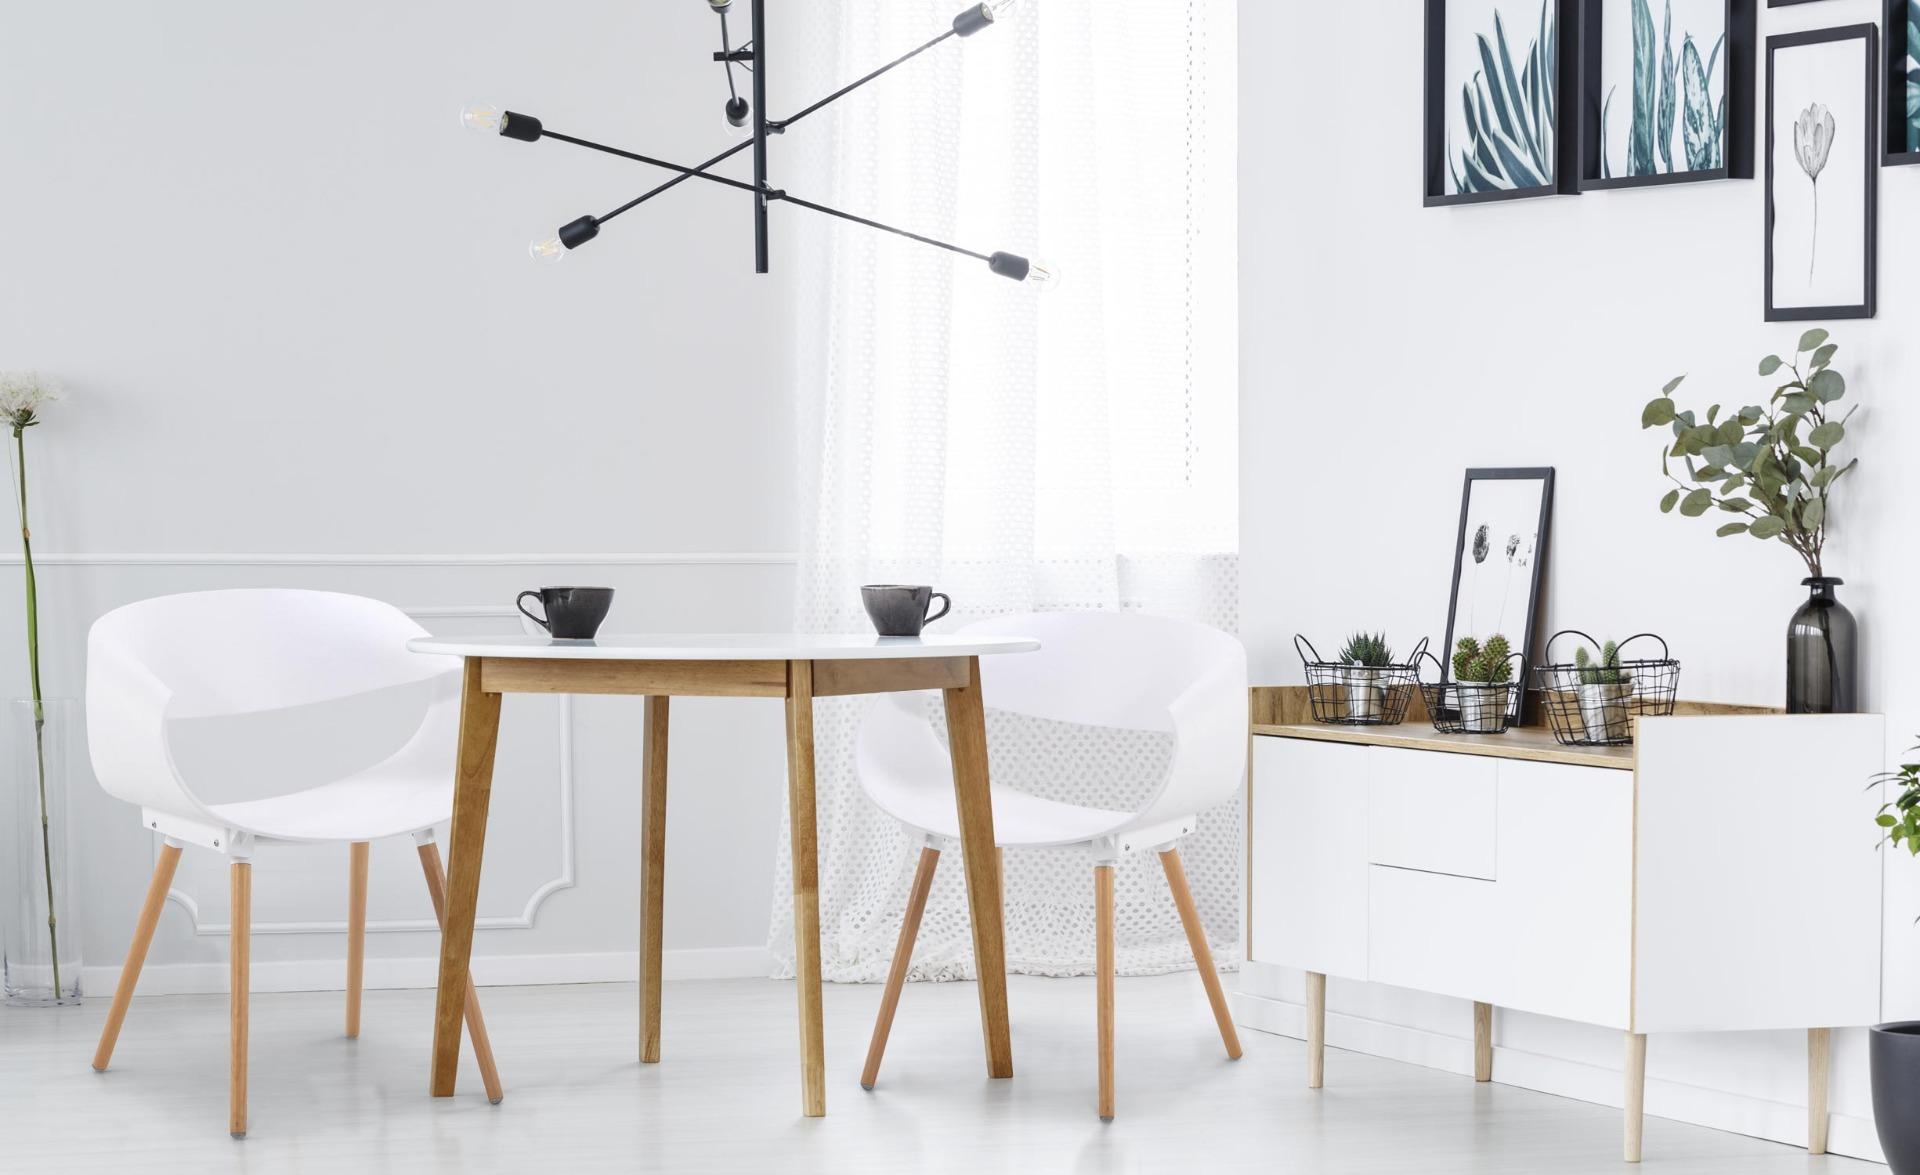 Lot de 20 chaises scandinaves design Zenata Blanc